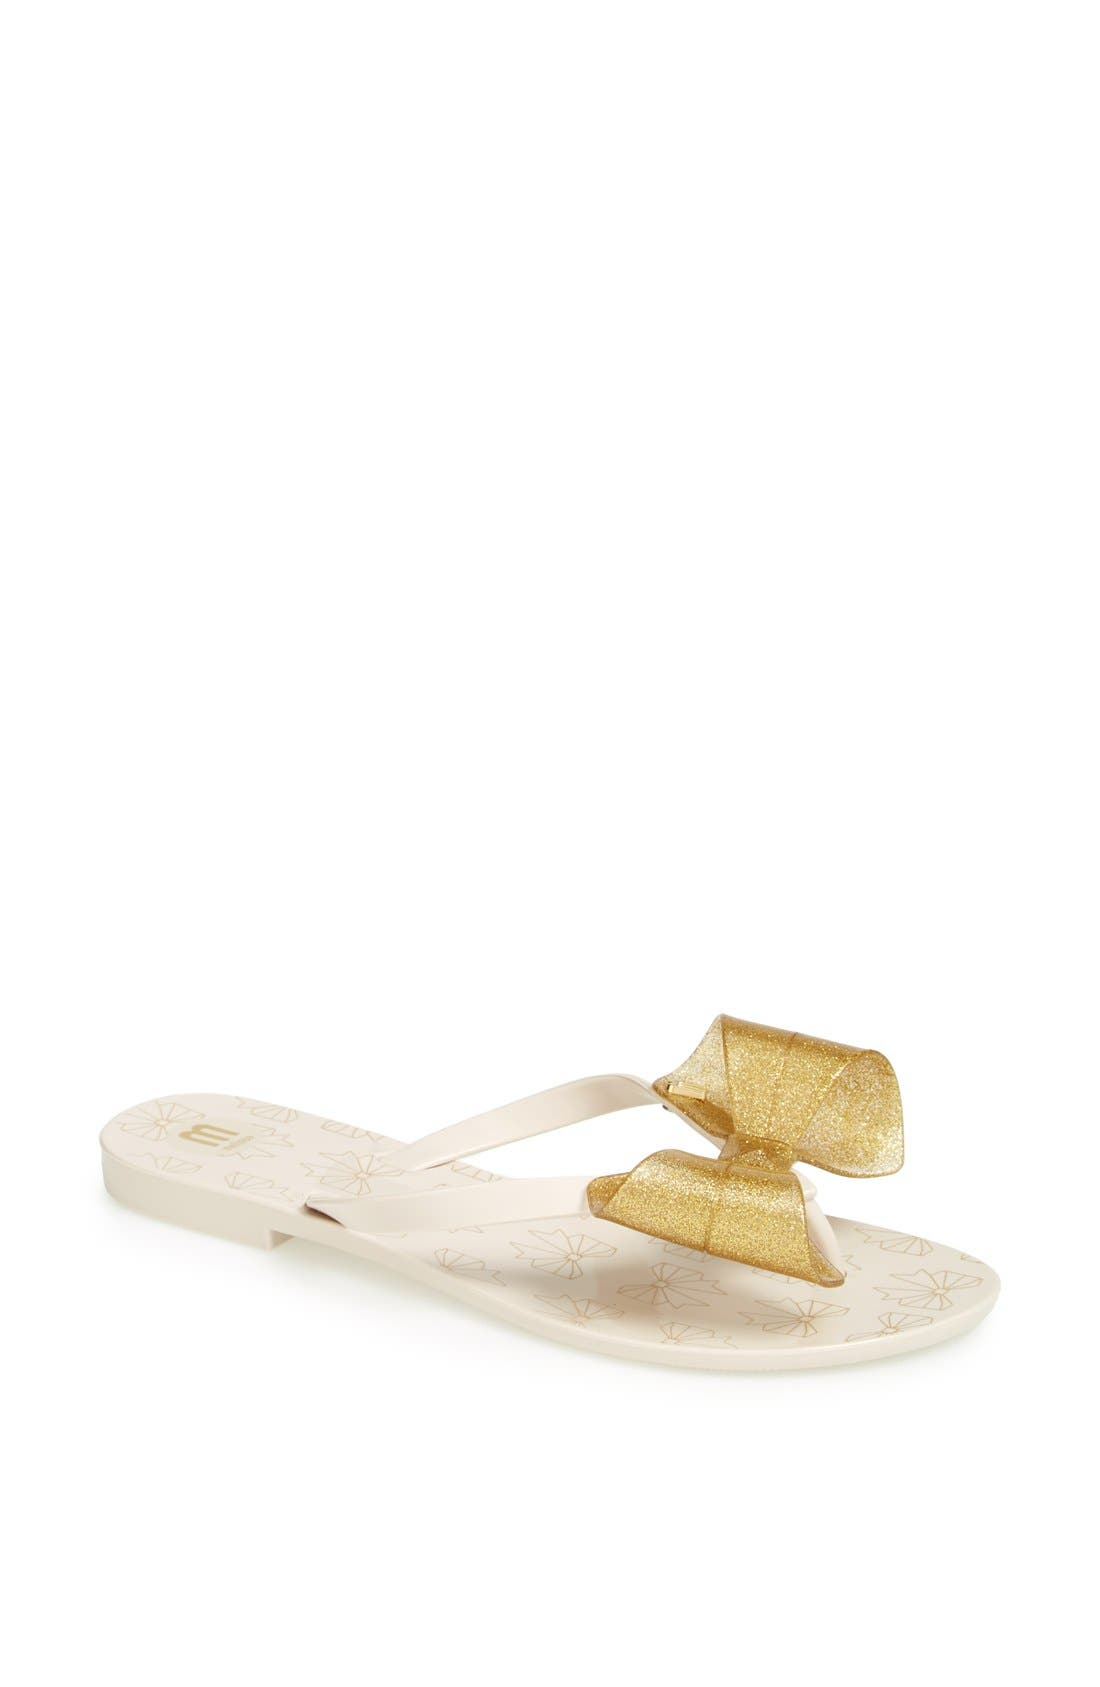 Main Image - Melissa 'Harmonic IV' Jelly Thong Sandal